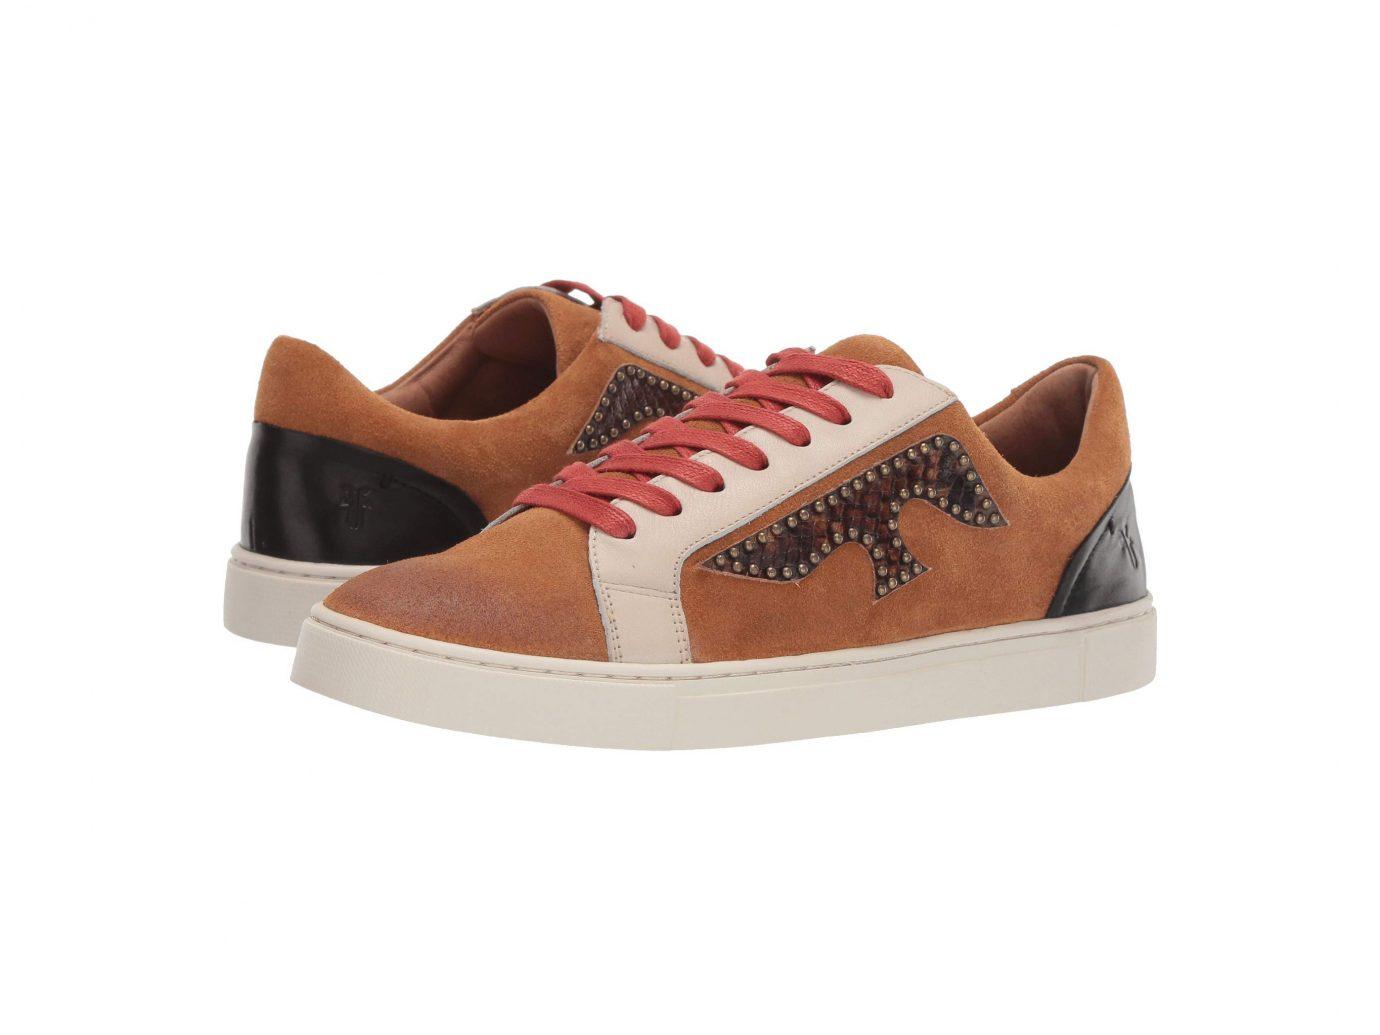 Frye Ivy Logo Patch Low Sneakers